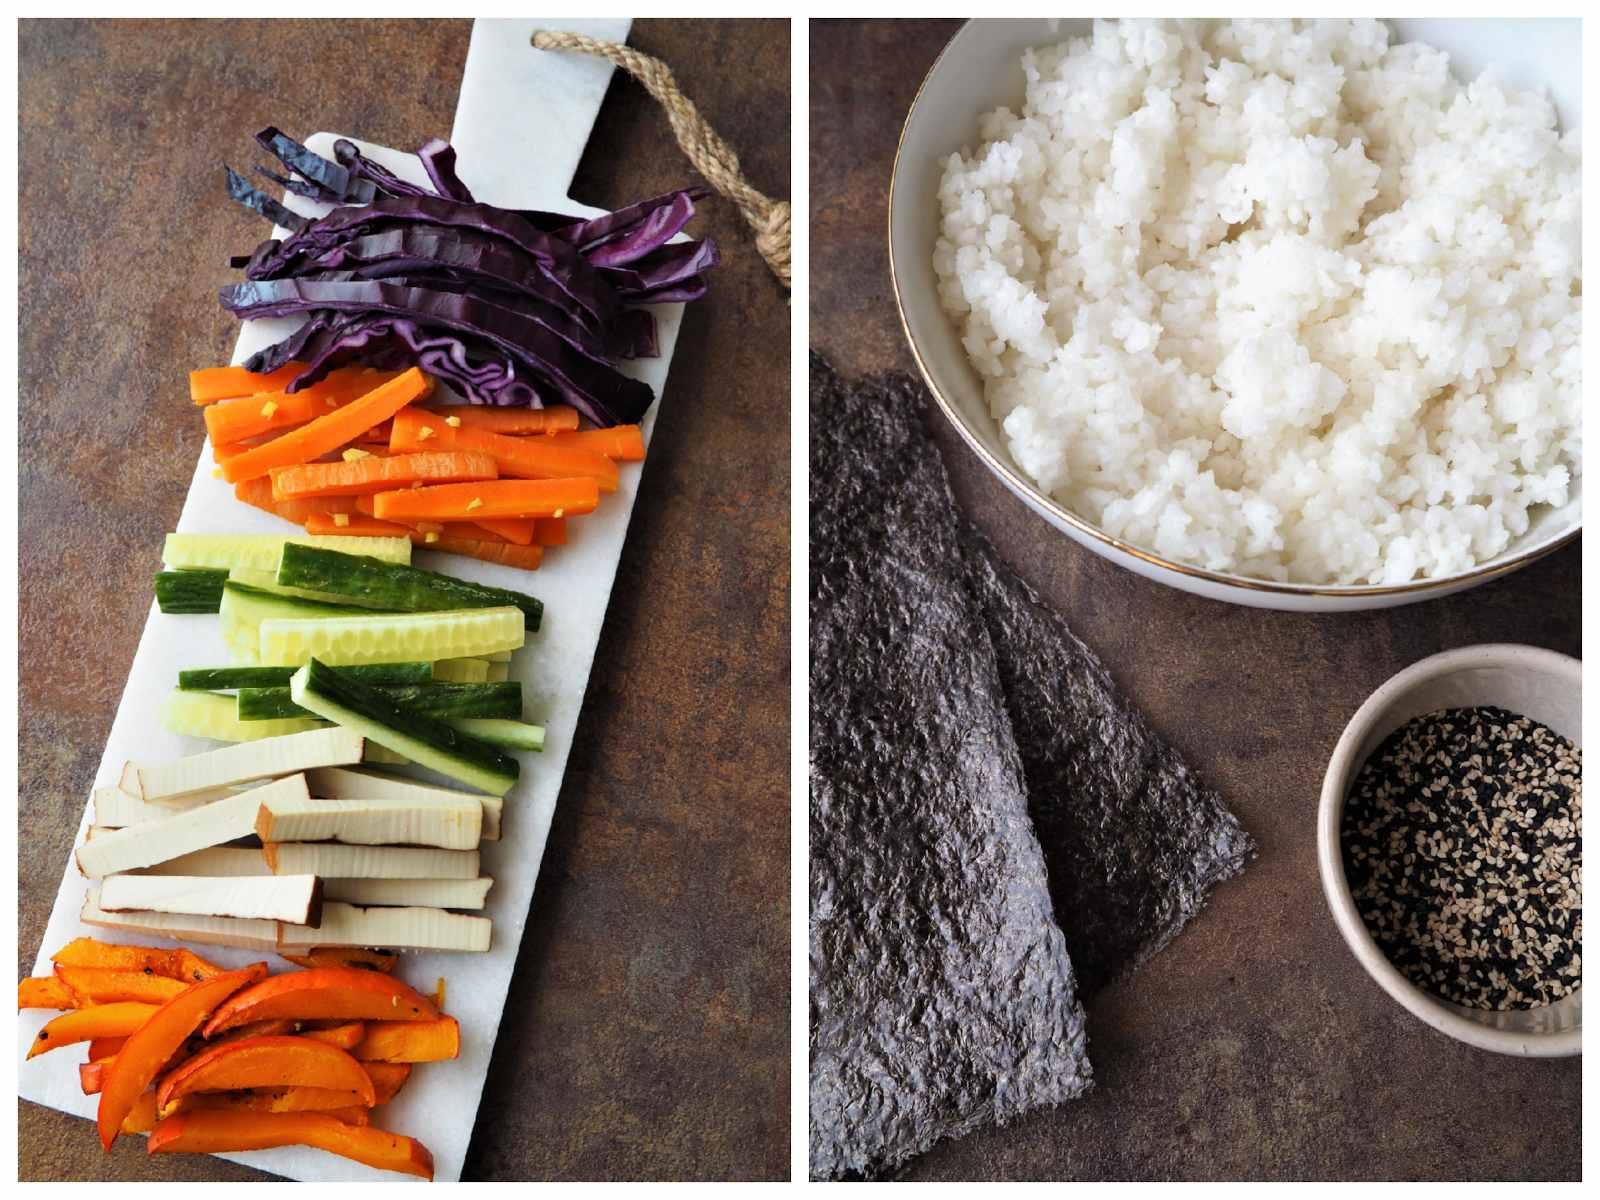 eganes Sushi selbermachen - verschiedene bunte Sorten - Zutaten